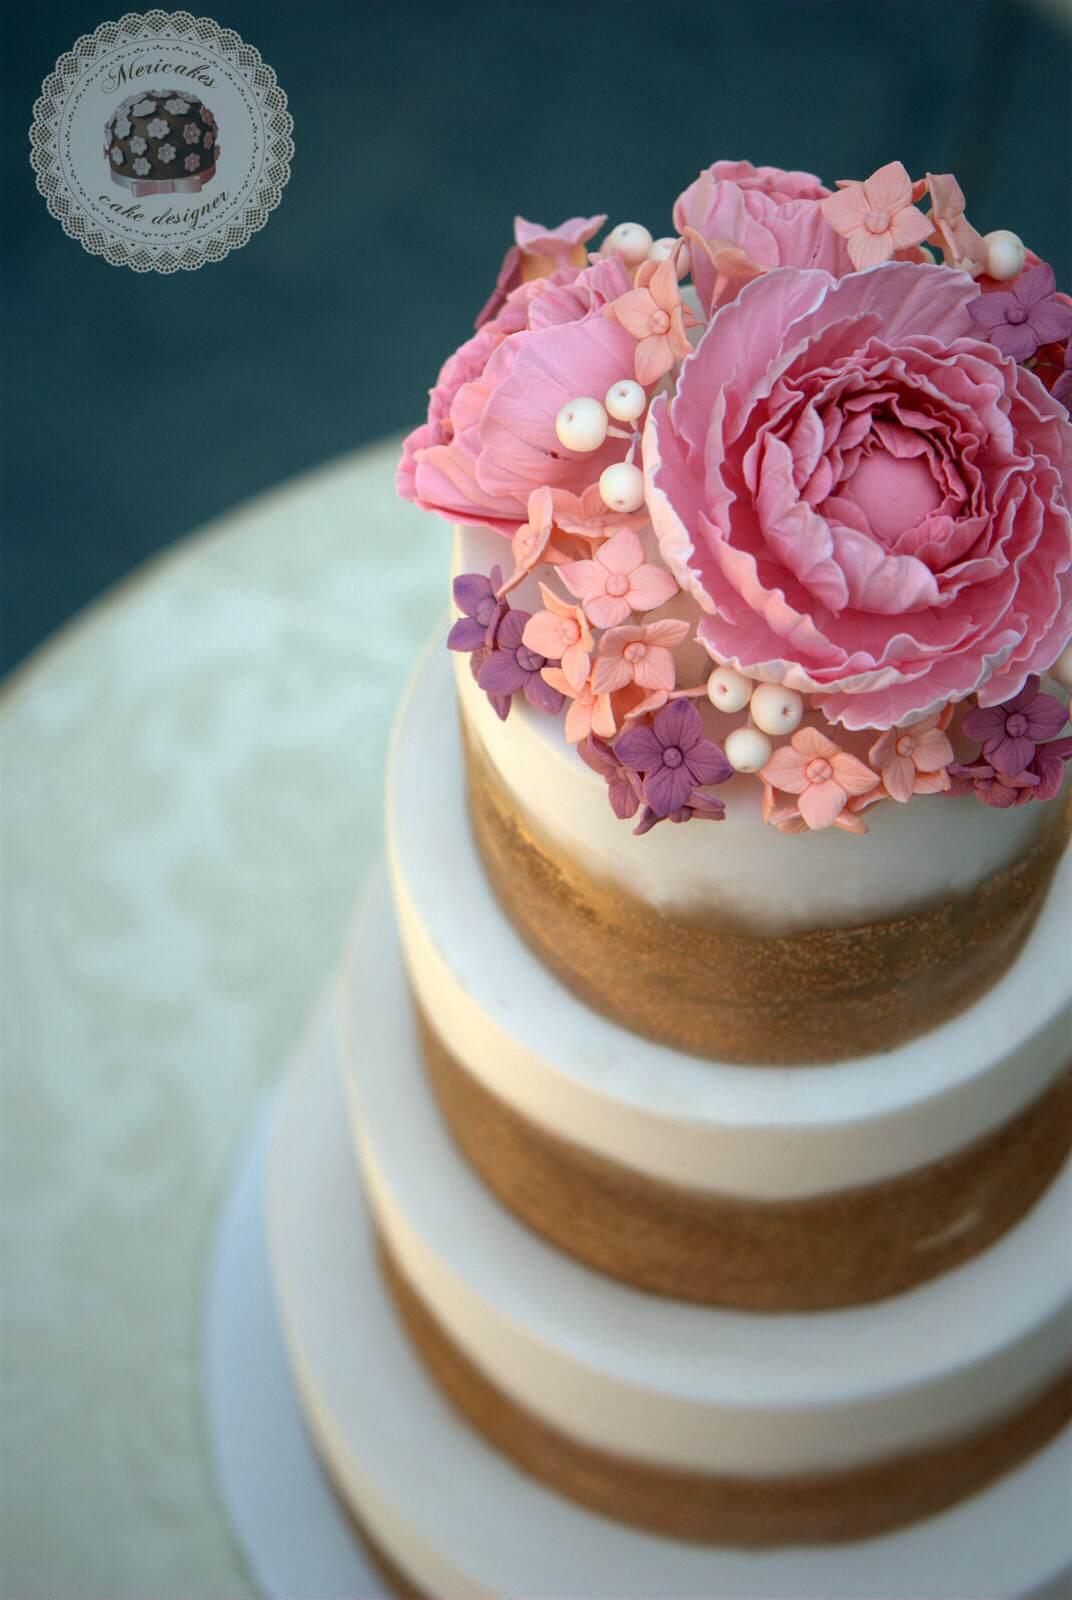 tarta-de-boda-mericakes-barcelona-wedding-cake-flores-de-azucar-sugar-flowers-7